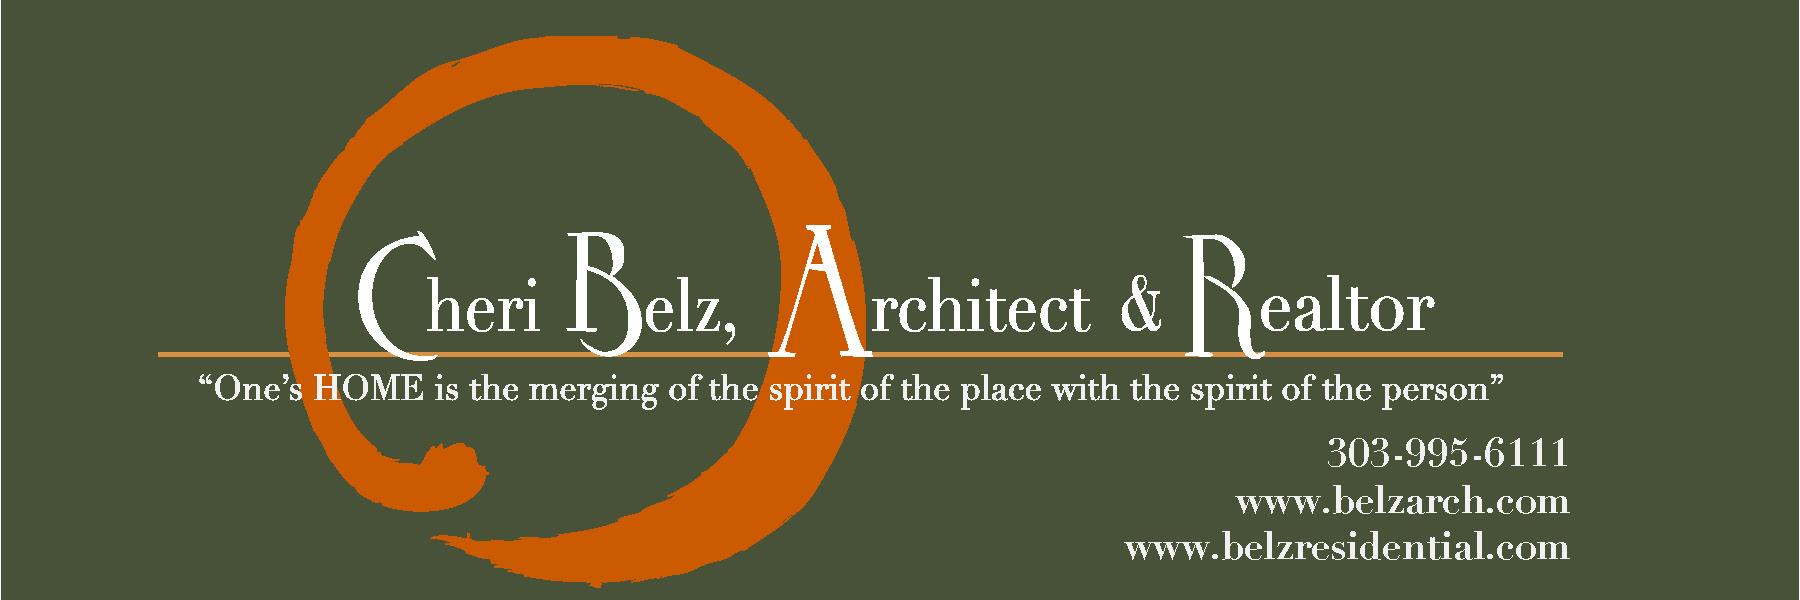 Cheri Belz Architect and Realtor